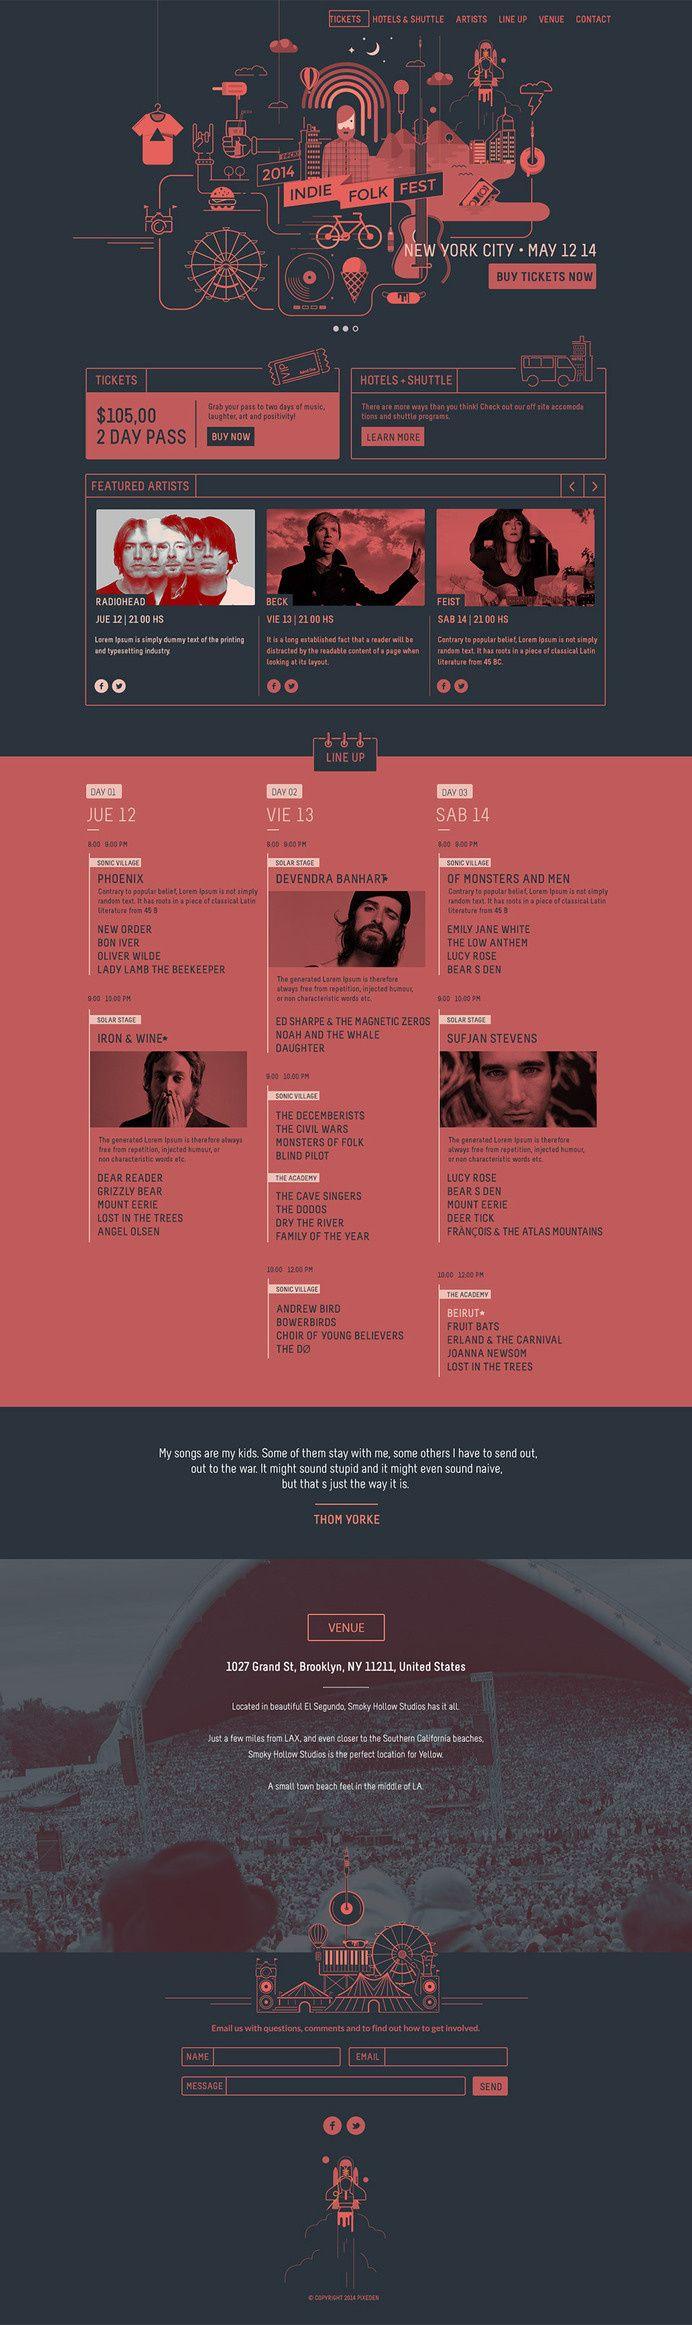 Psd Festival Event Website Template #psd template #web